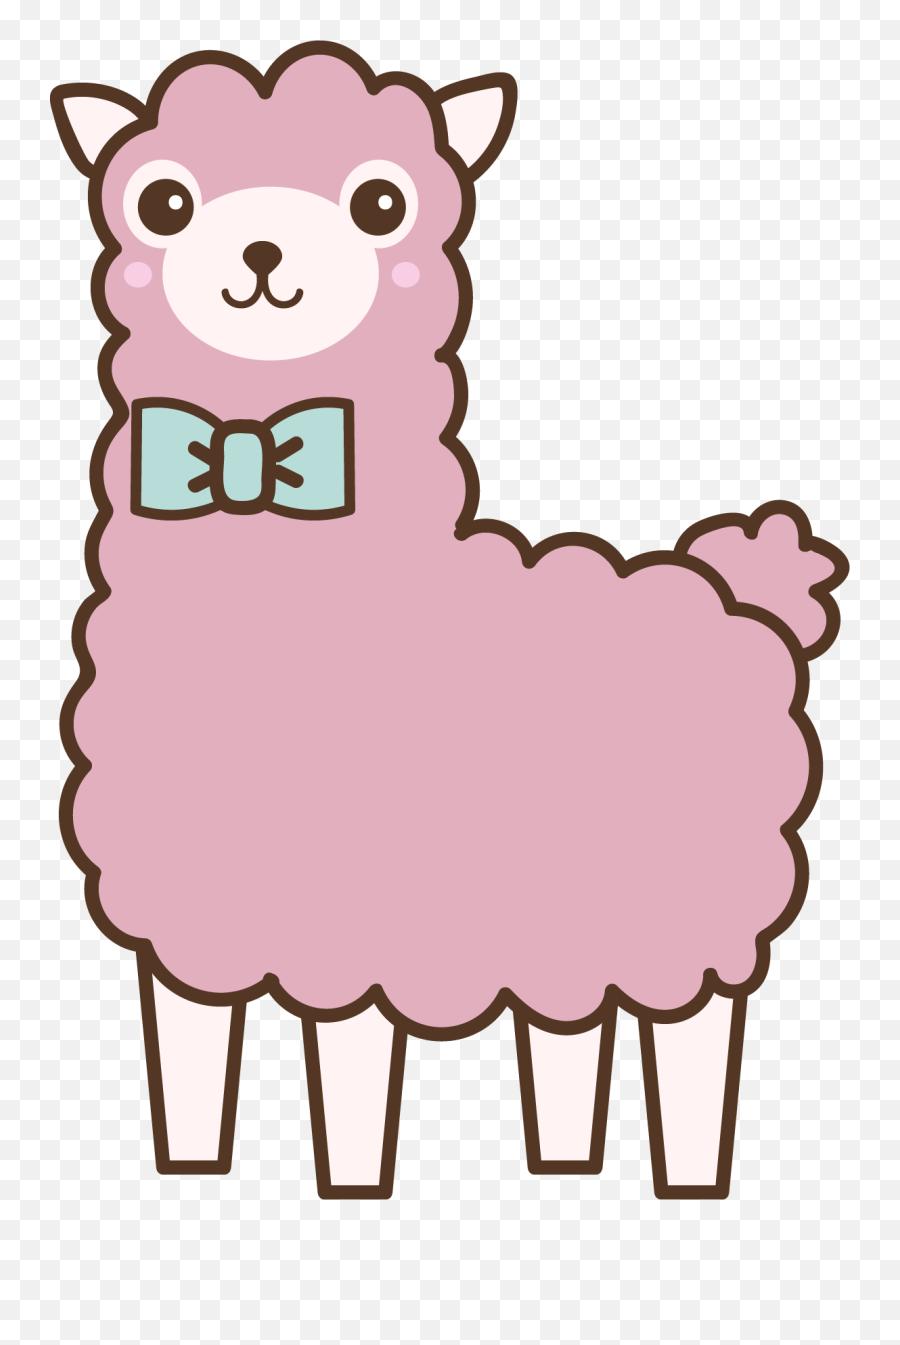 Download Clipart Cute Alpaca Png Printable Llama Coloring Page Png Cute Free Transparent Png Images Pngaaa Com